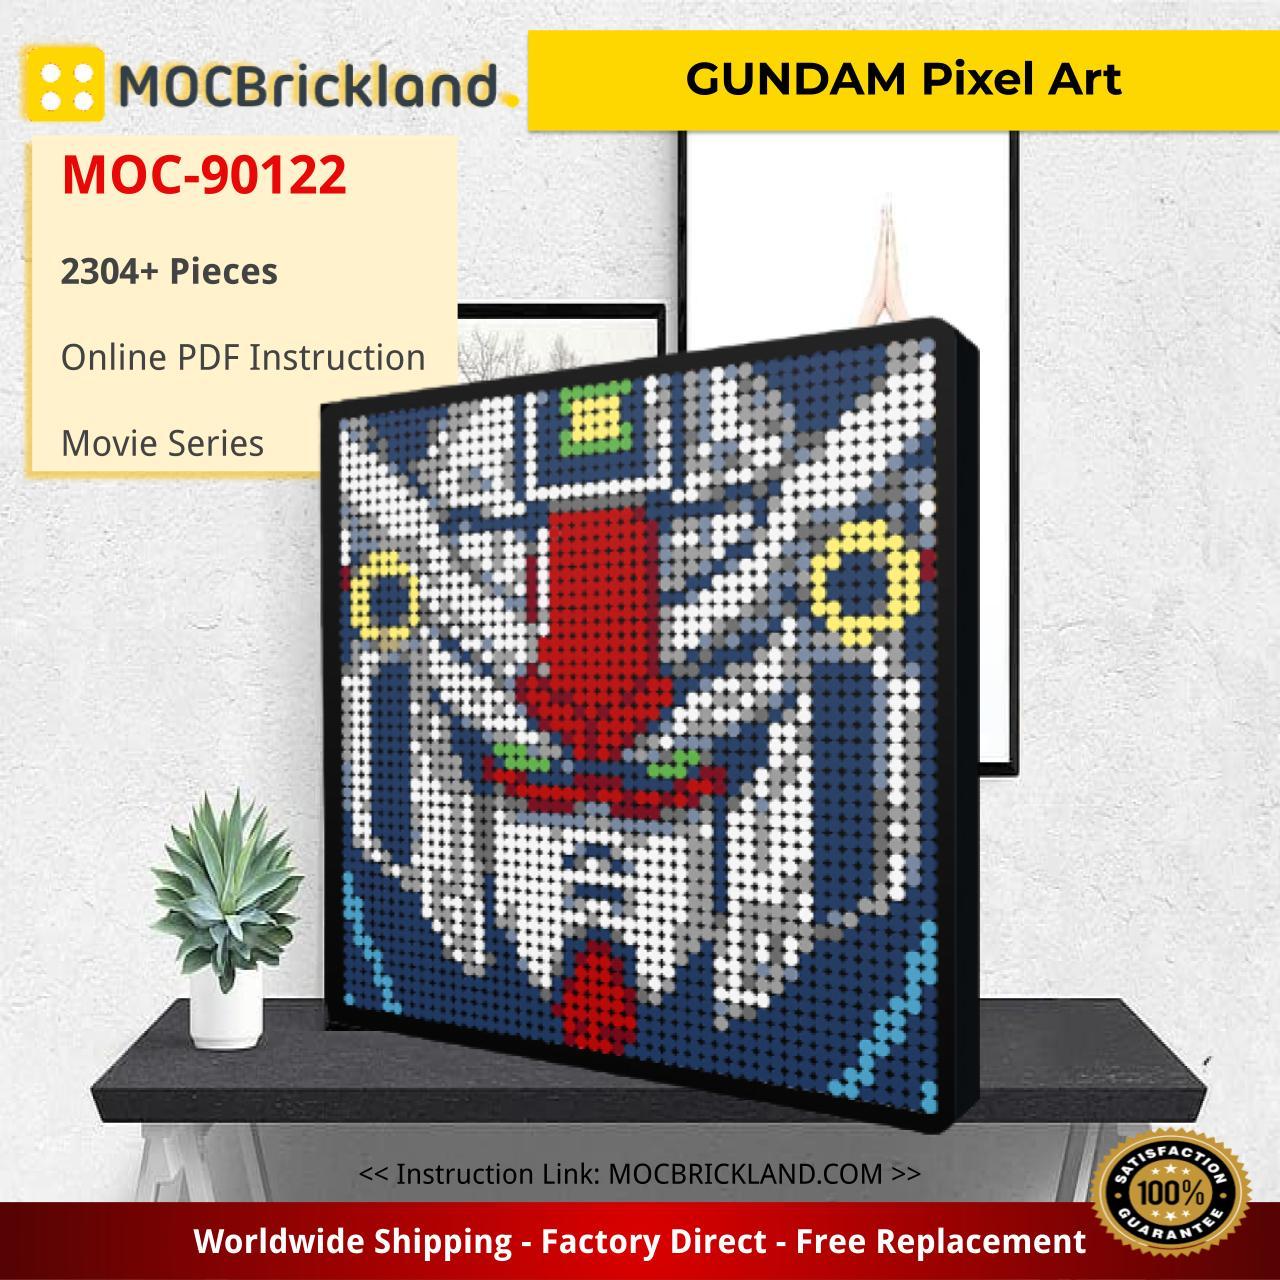 Movie MOC-90122 GUNDAM Pixel Art MOCBRICKLAND